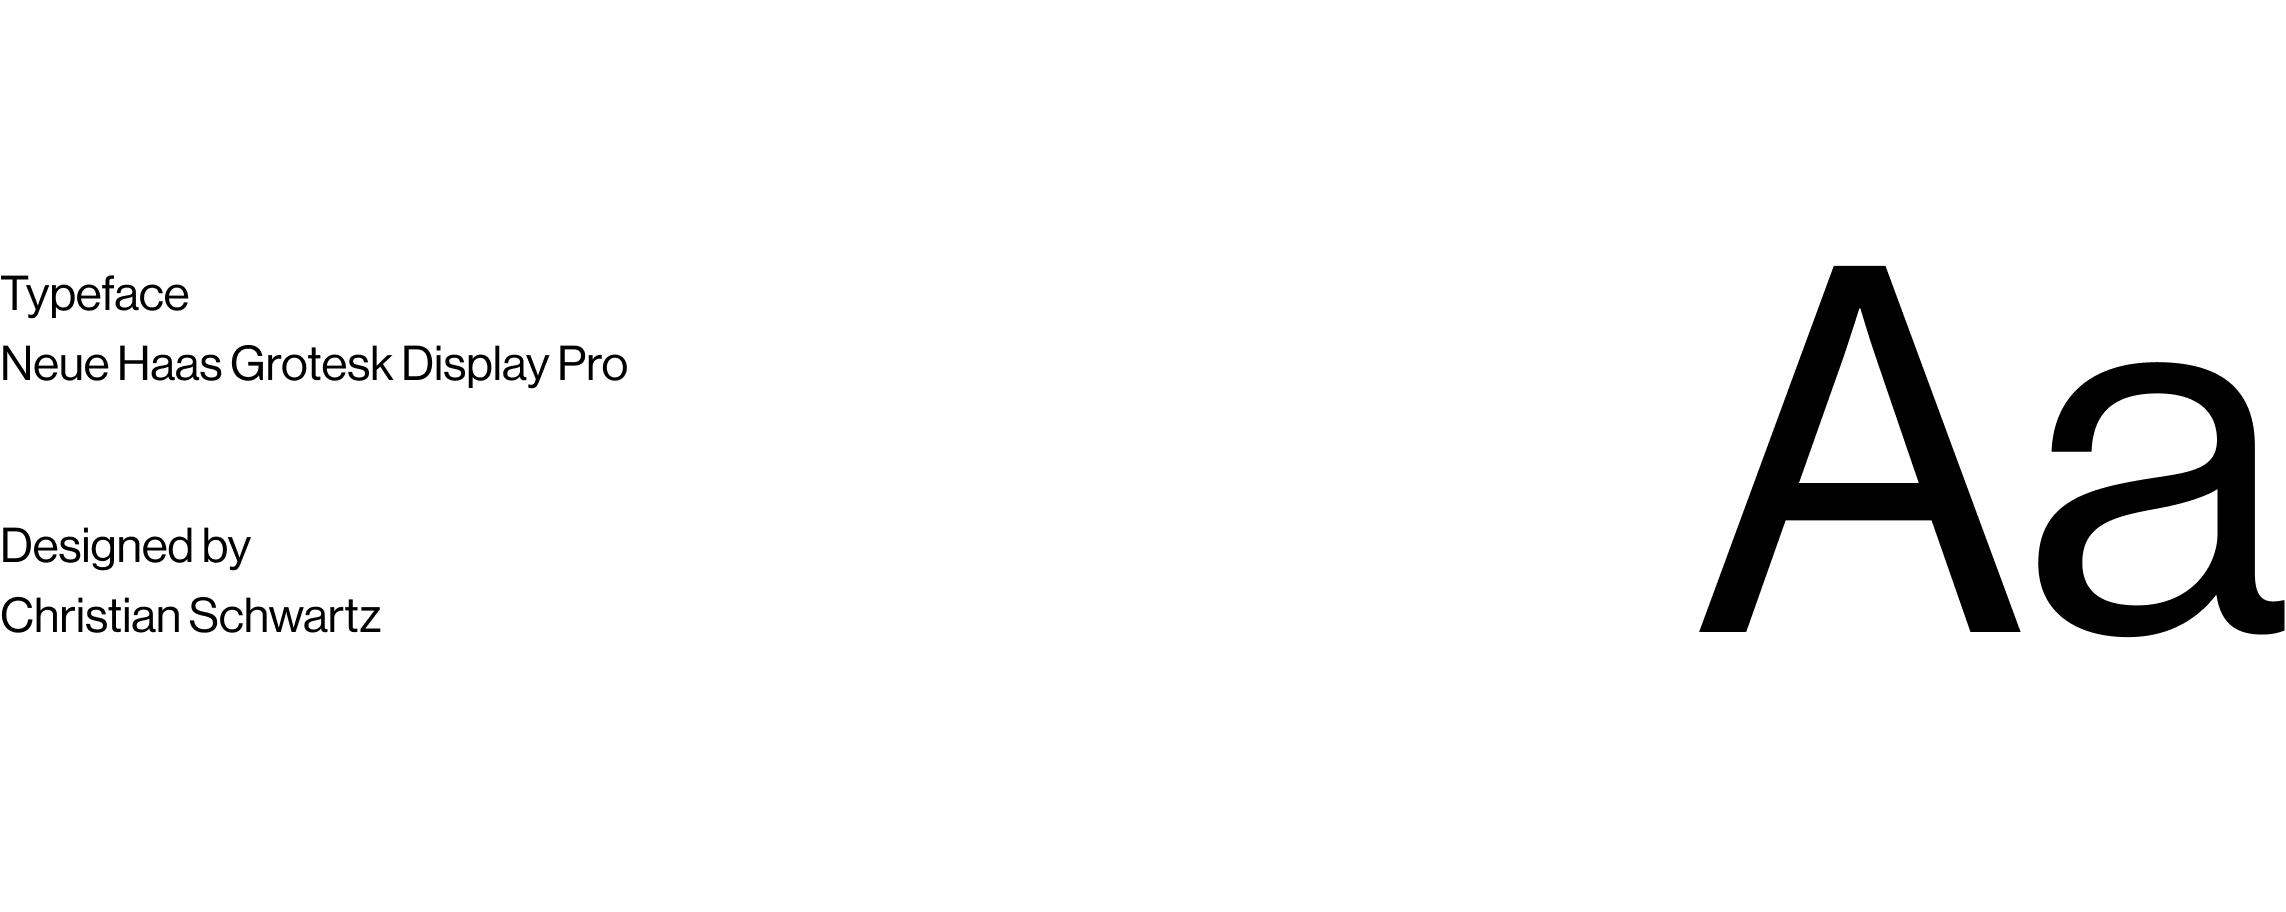 Typography - Folia Scandinavica Posnaniensia